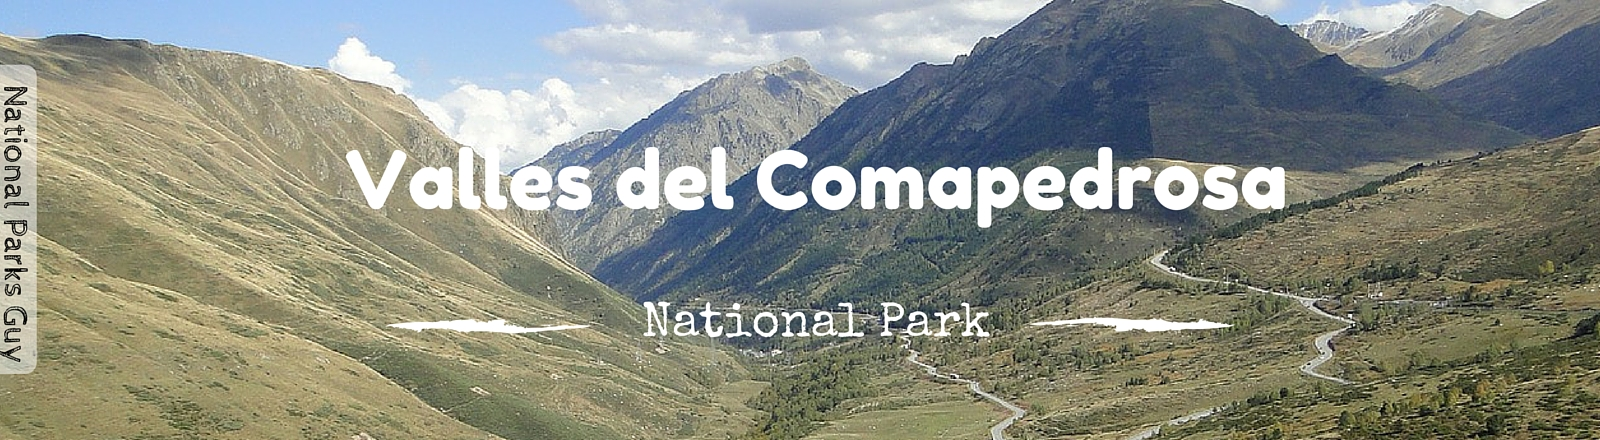 Valles del Comapedrosa Nature Park, National Parks Guy